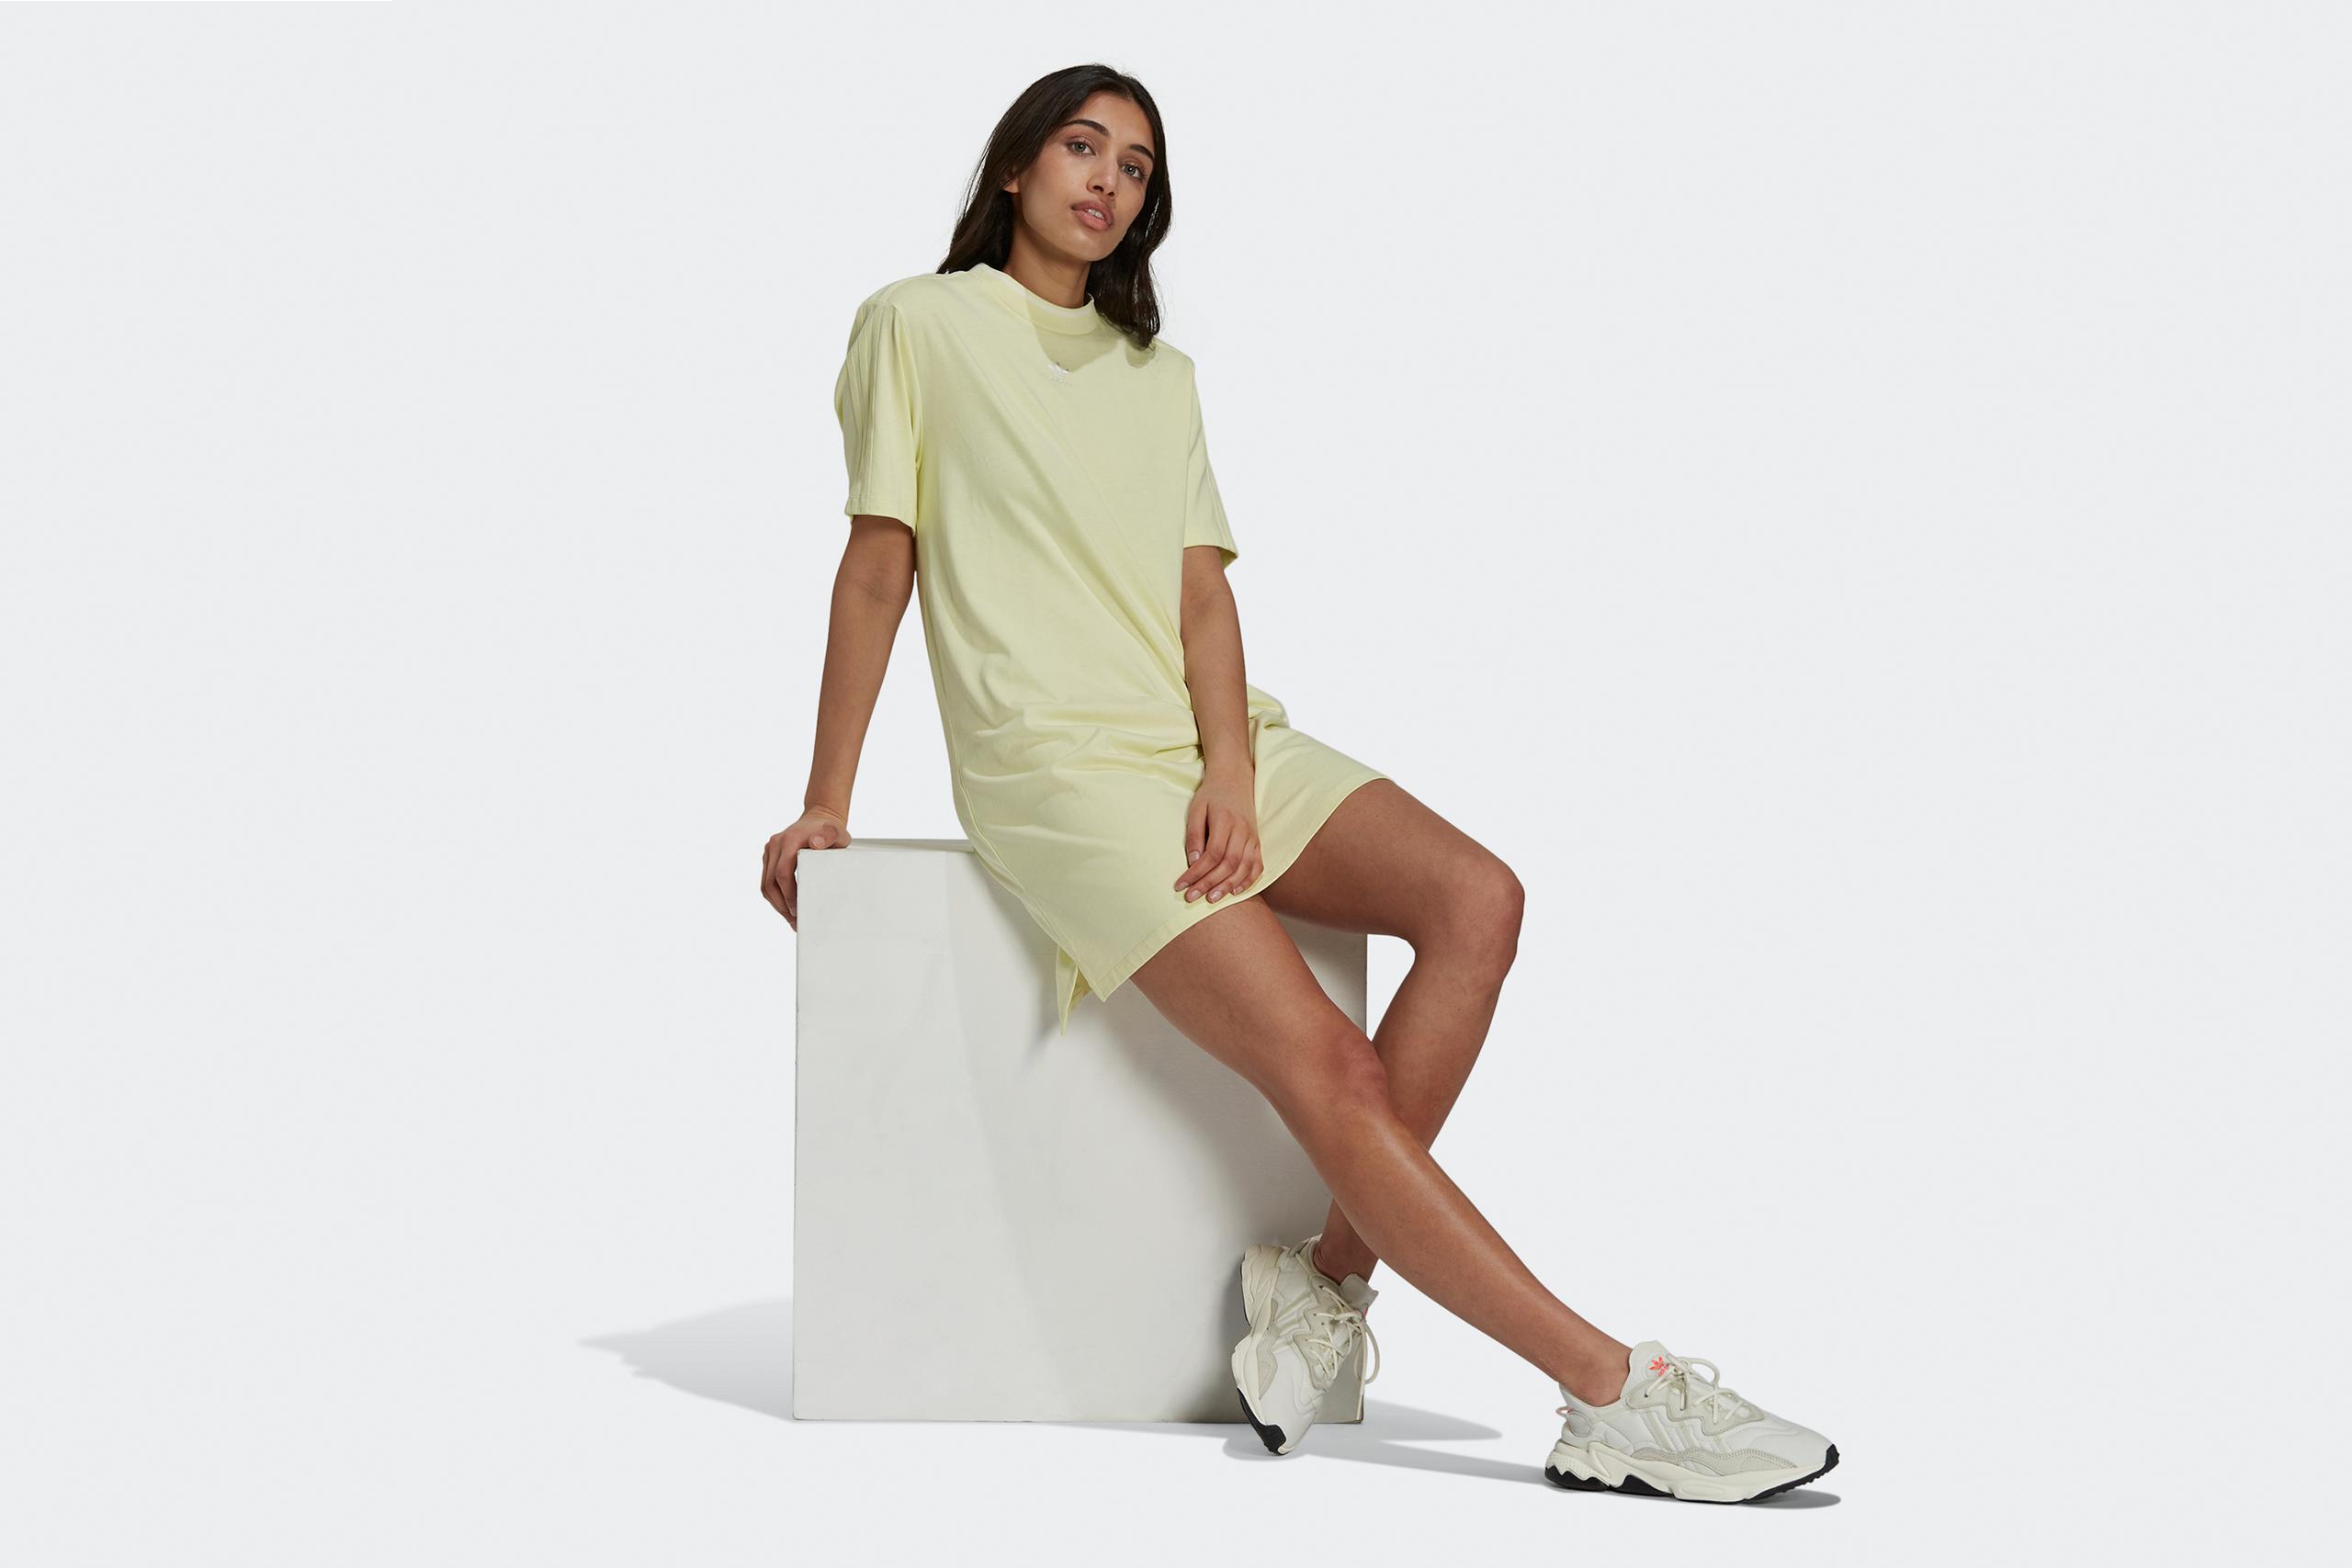 Adidas Women's Tee Dress Tennis Luxe Pack Hazy Yellow